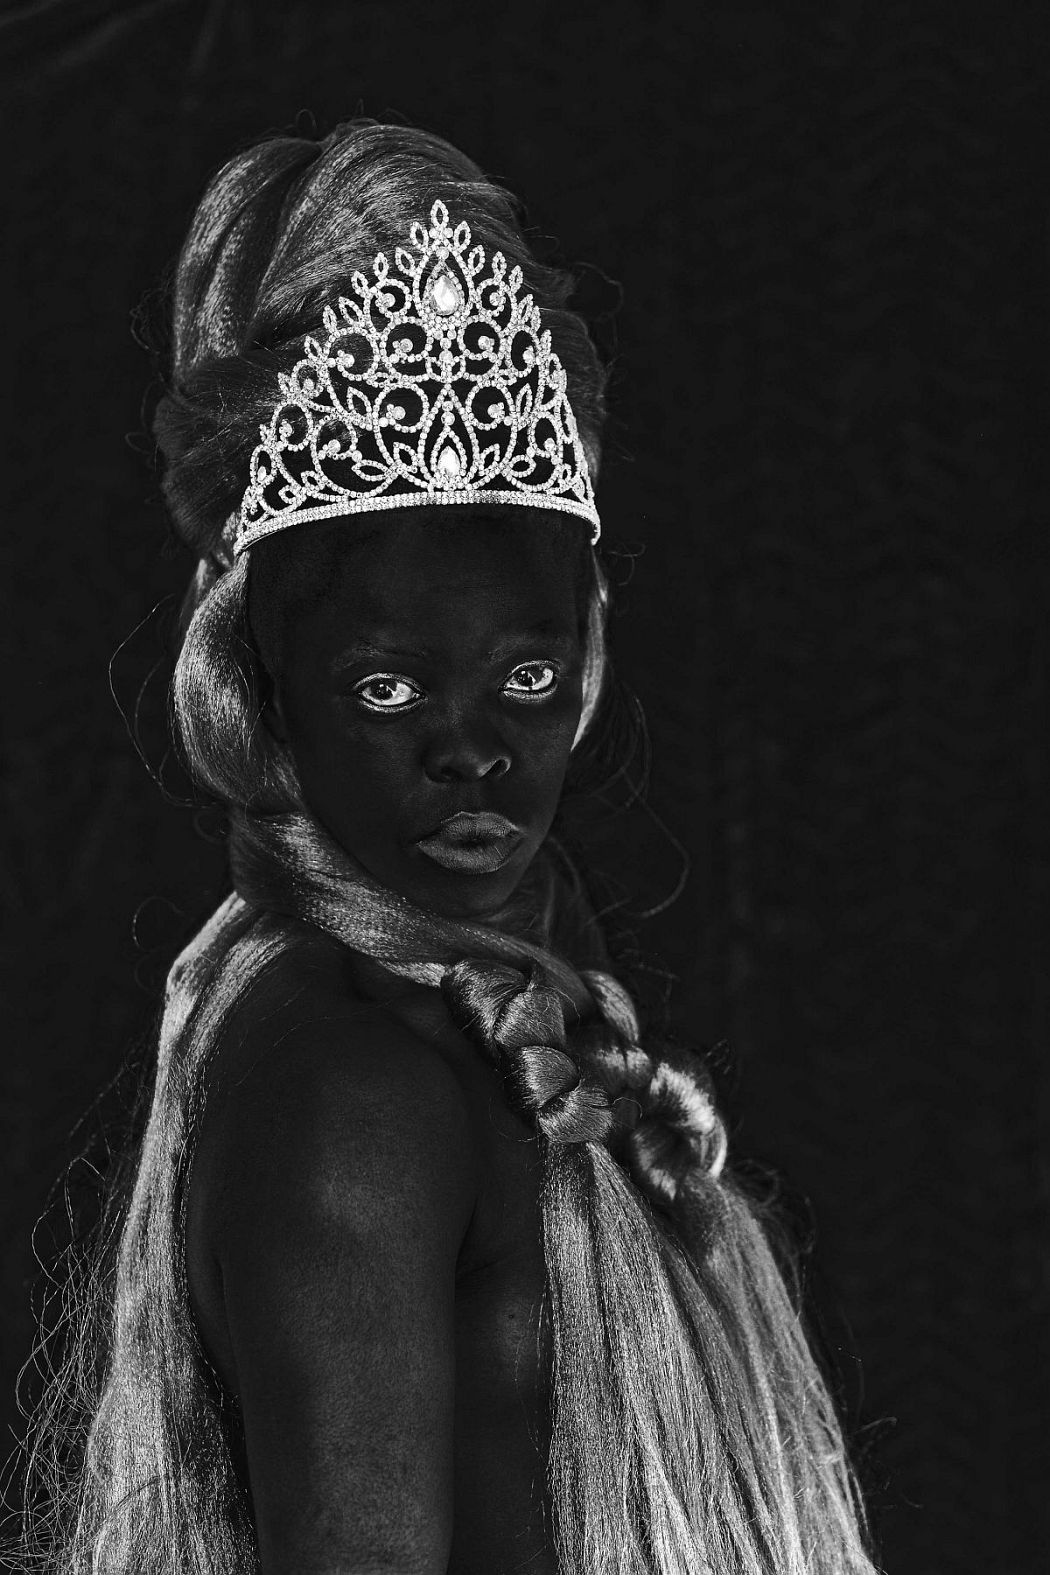 Zanele Muholi, Ntozabantu VI (Parktown), 2016